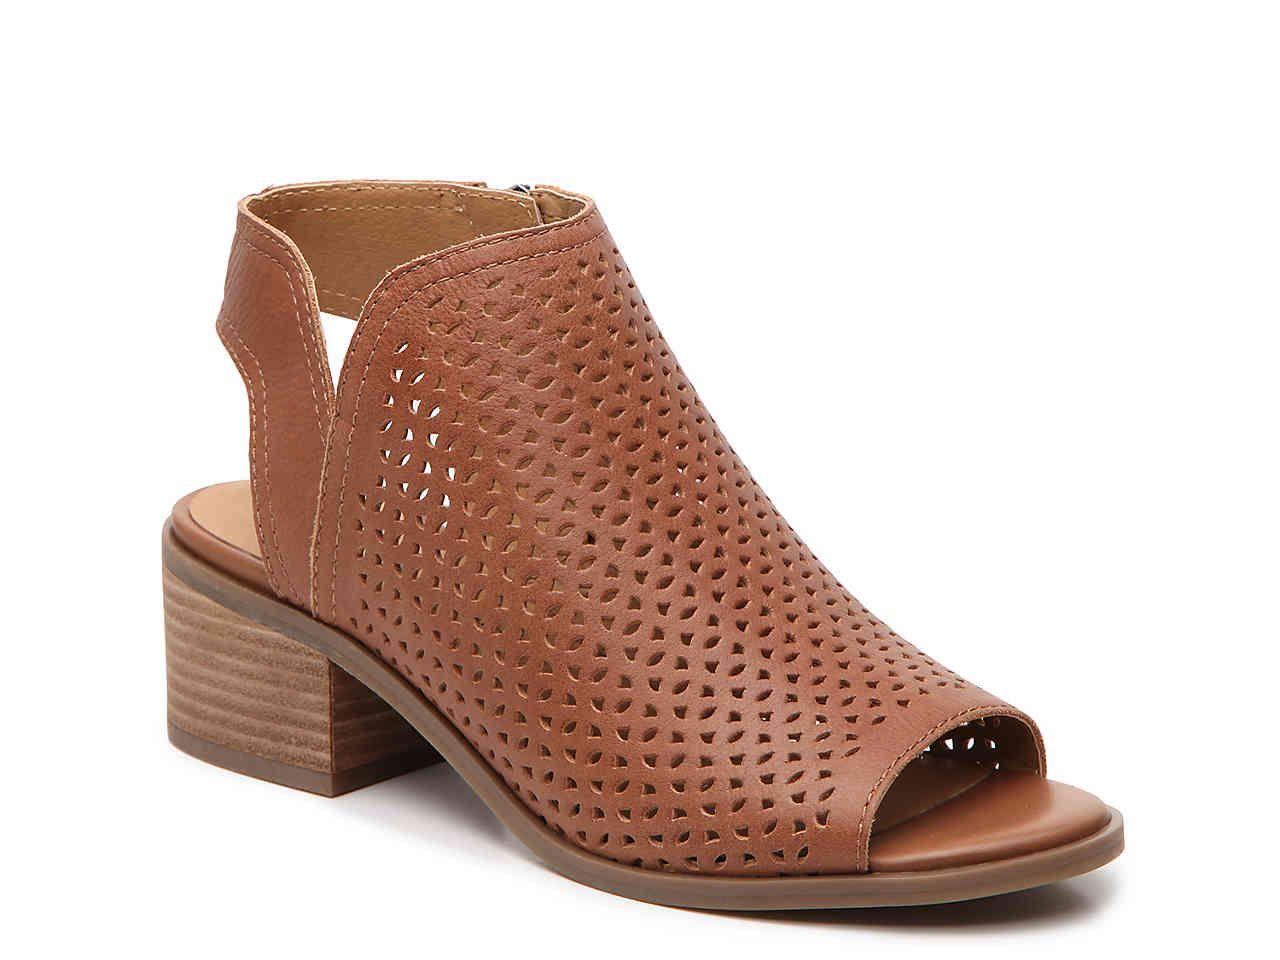 Lucky Brand Nonina Sandal Women S Shoes Dsw Sandals Heels Heels Giuseppe Zanotti Heels